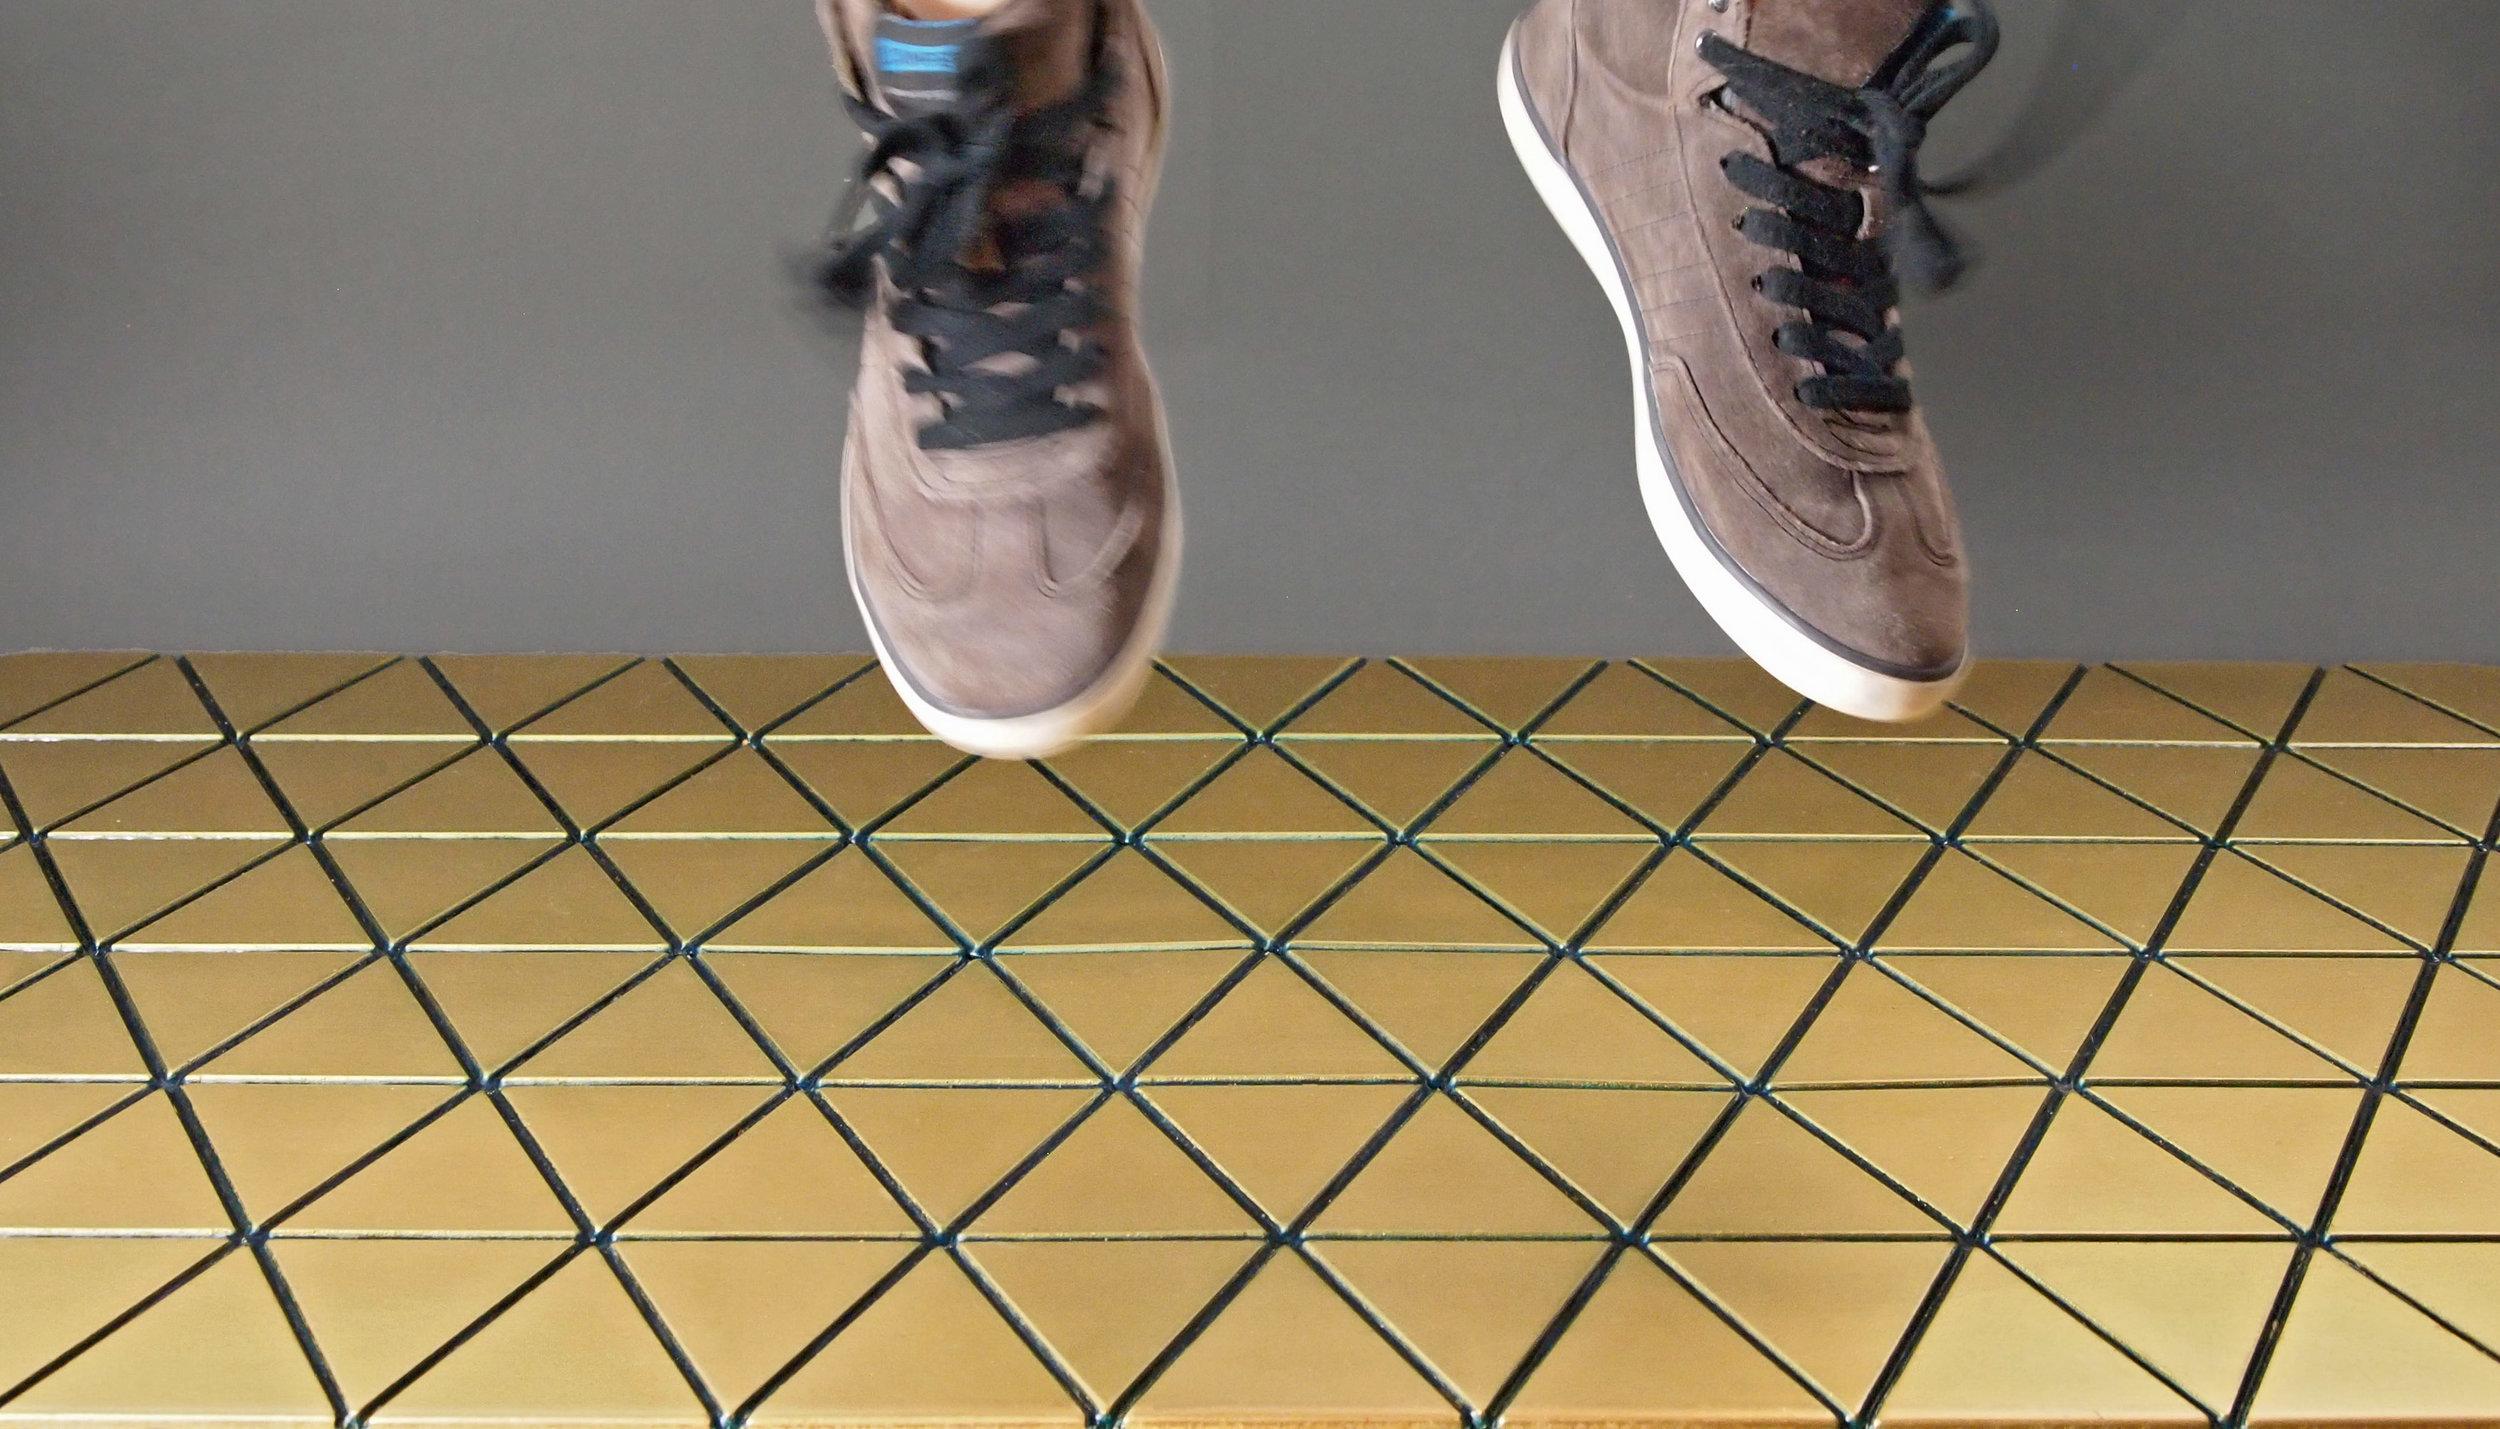 Airea Floor mat Gold jump Colored.jpg